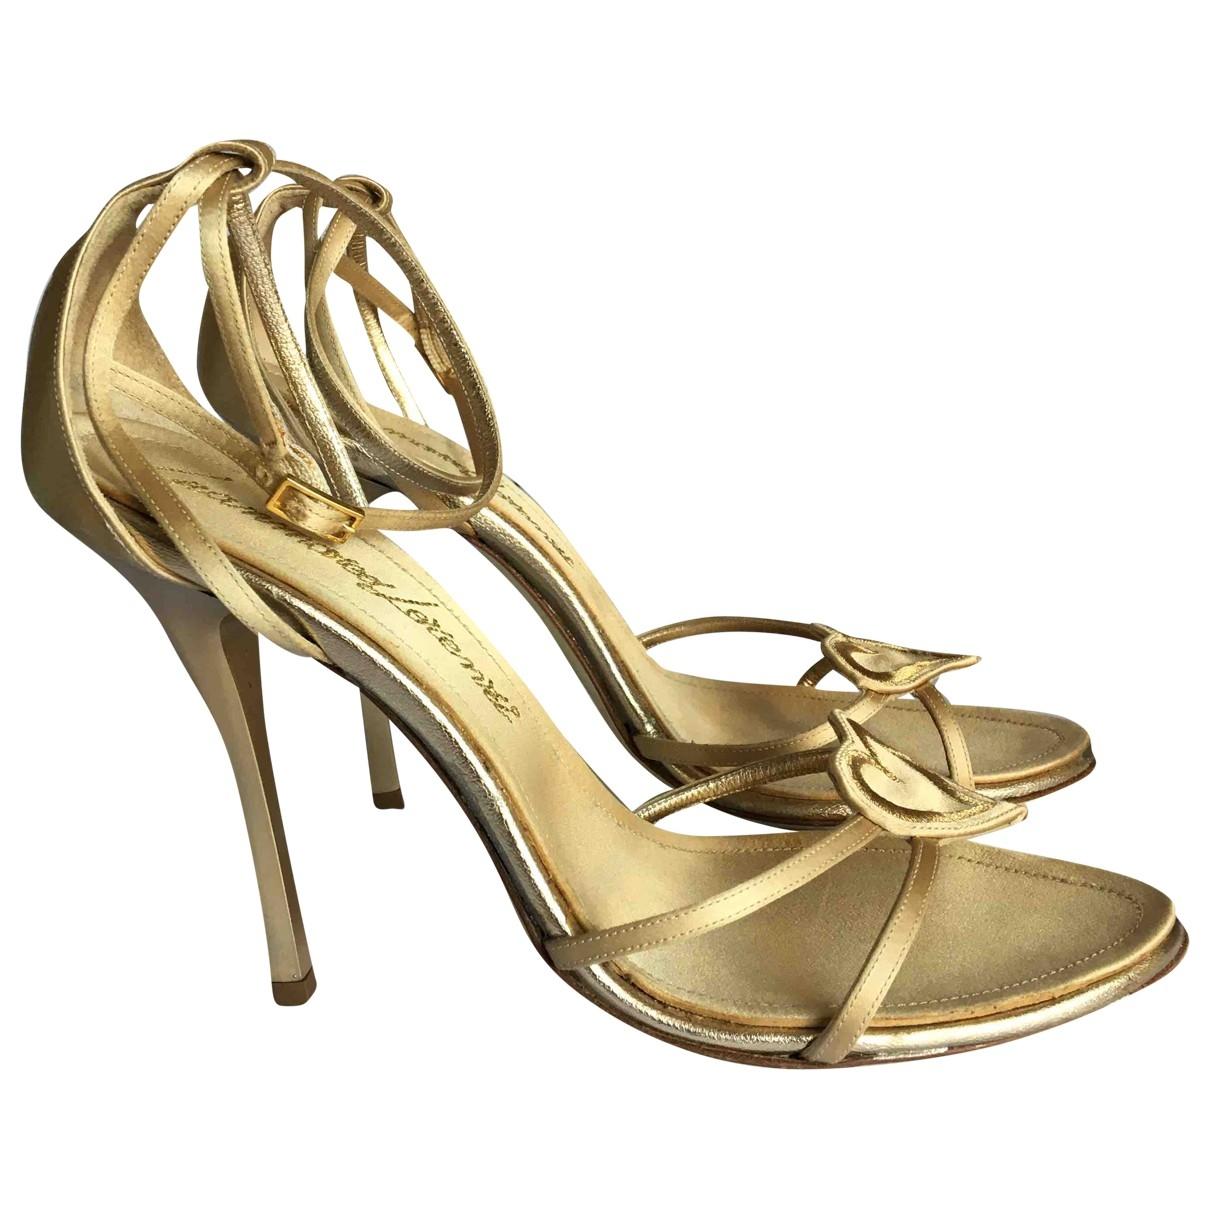 Sandalias de Lona Gianmarco Lorenzi